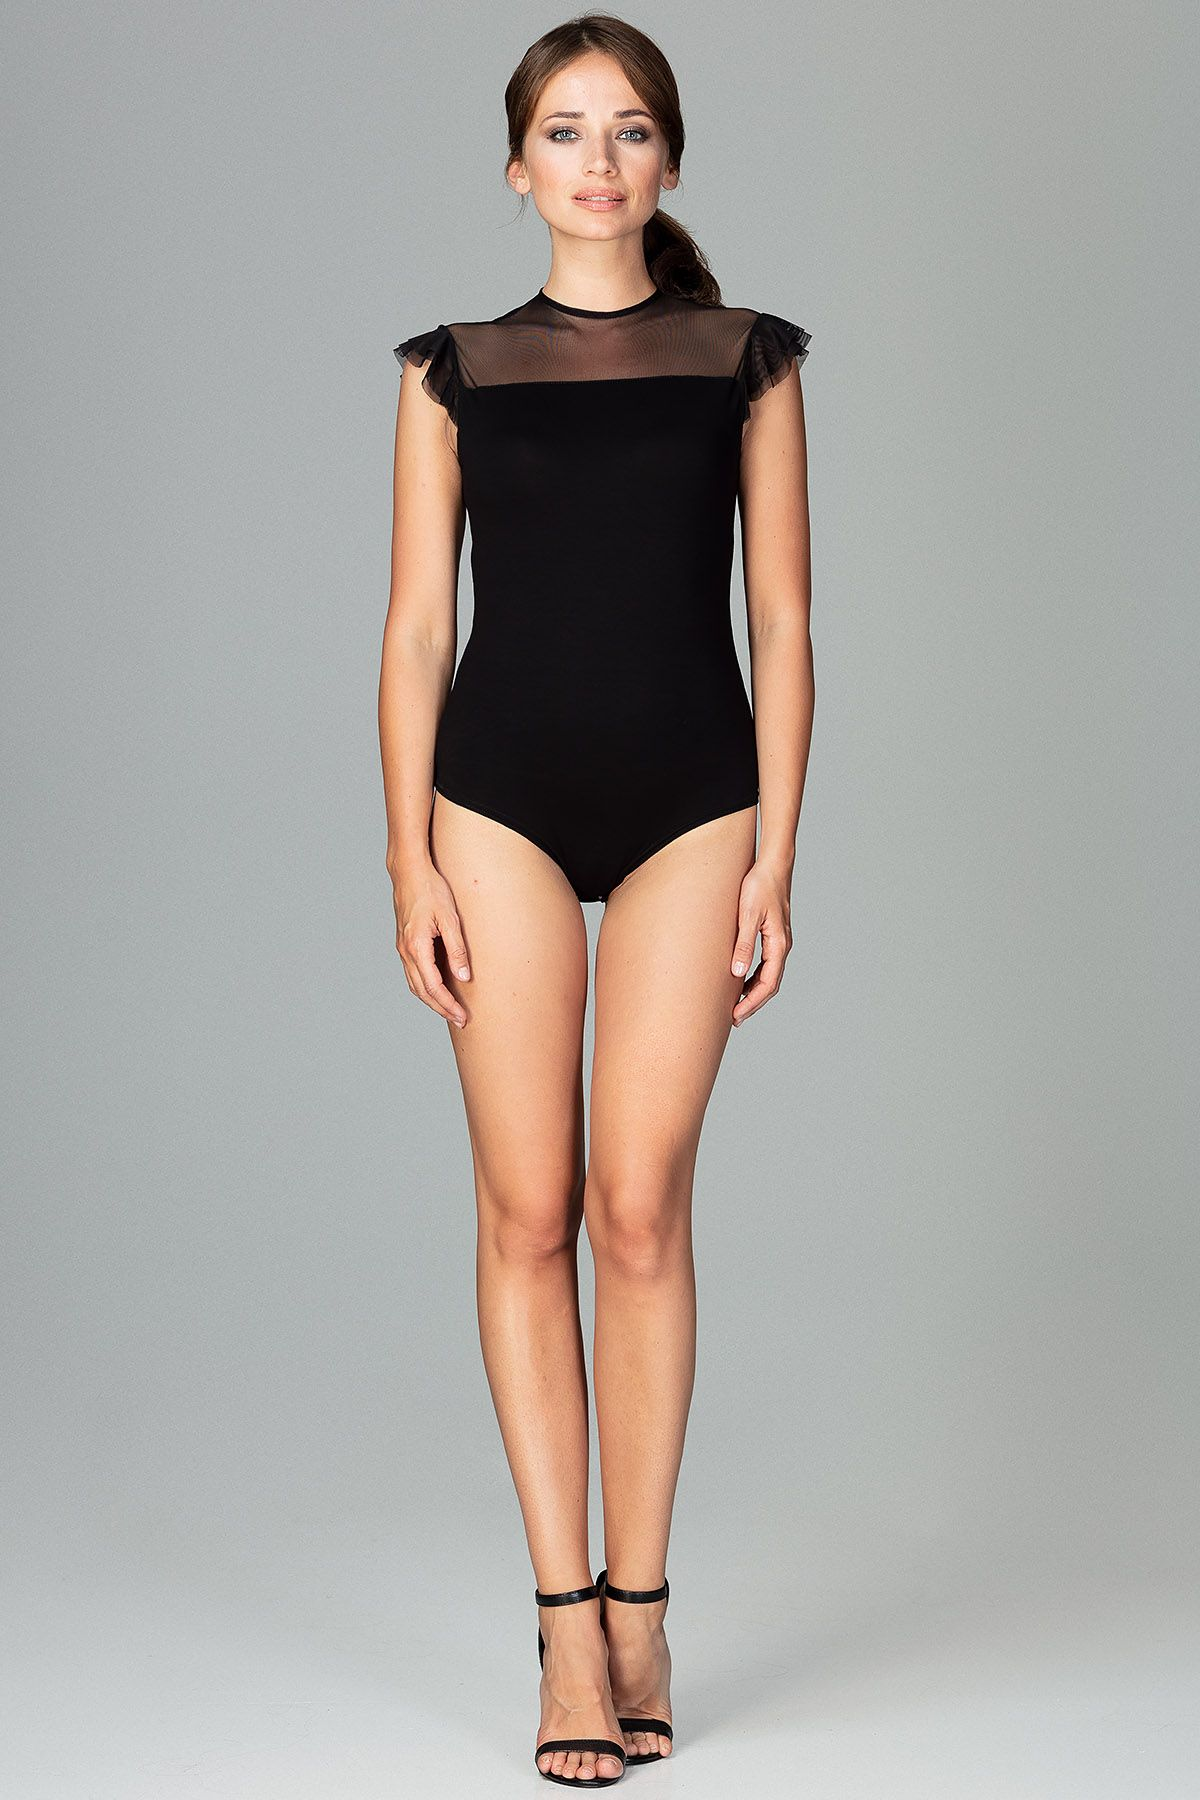 Black Bodysuit With Short Sleeves